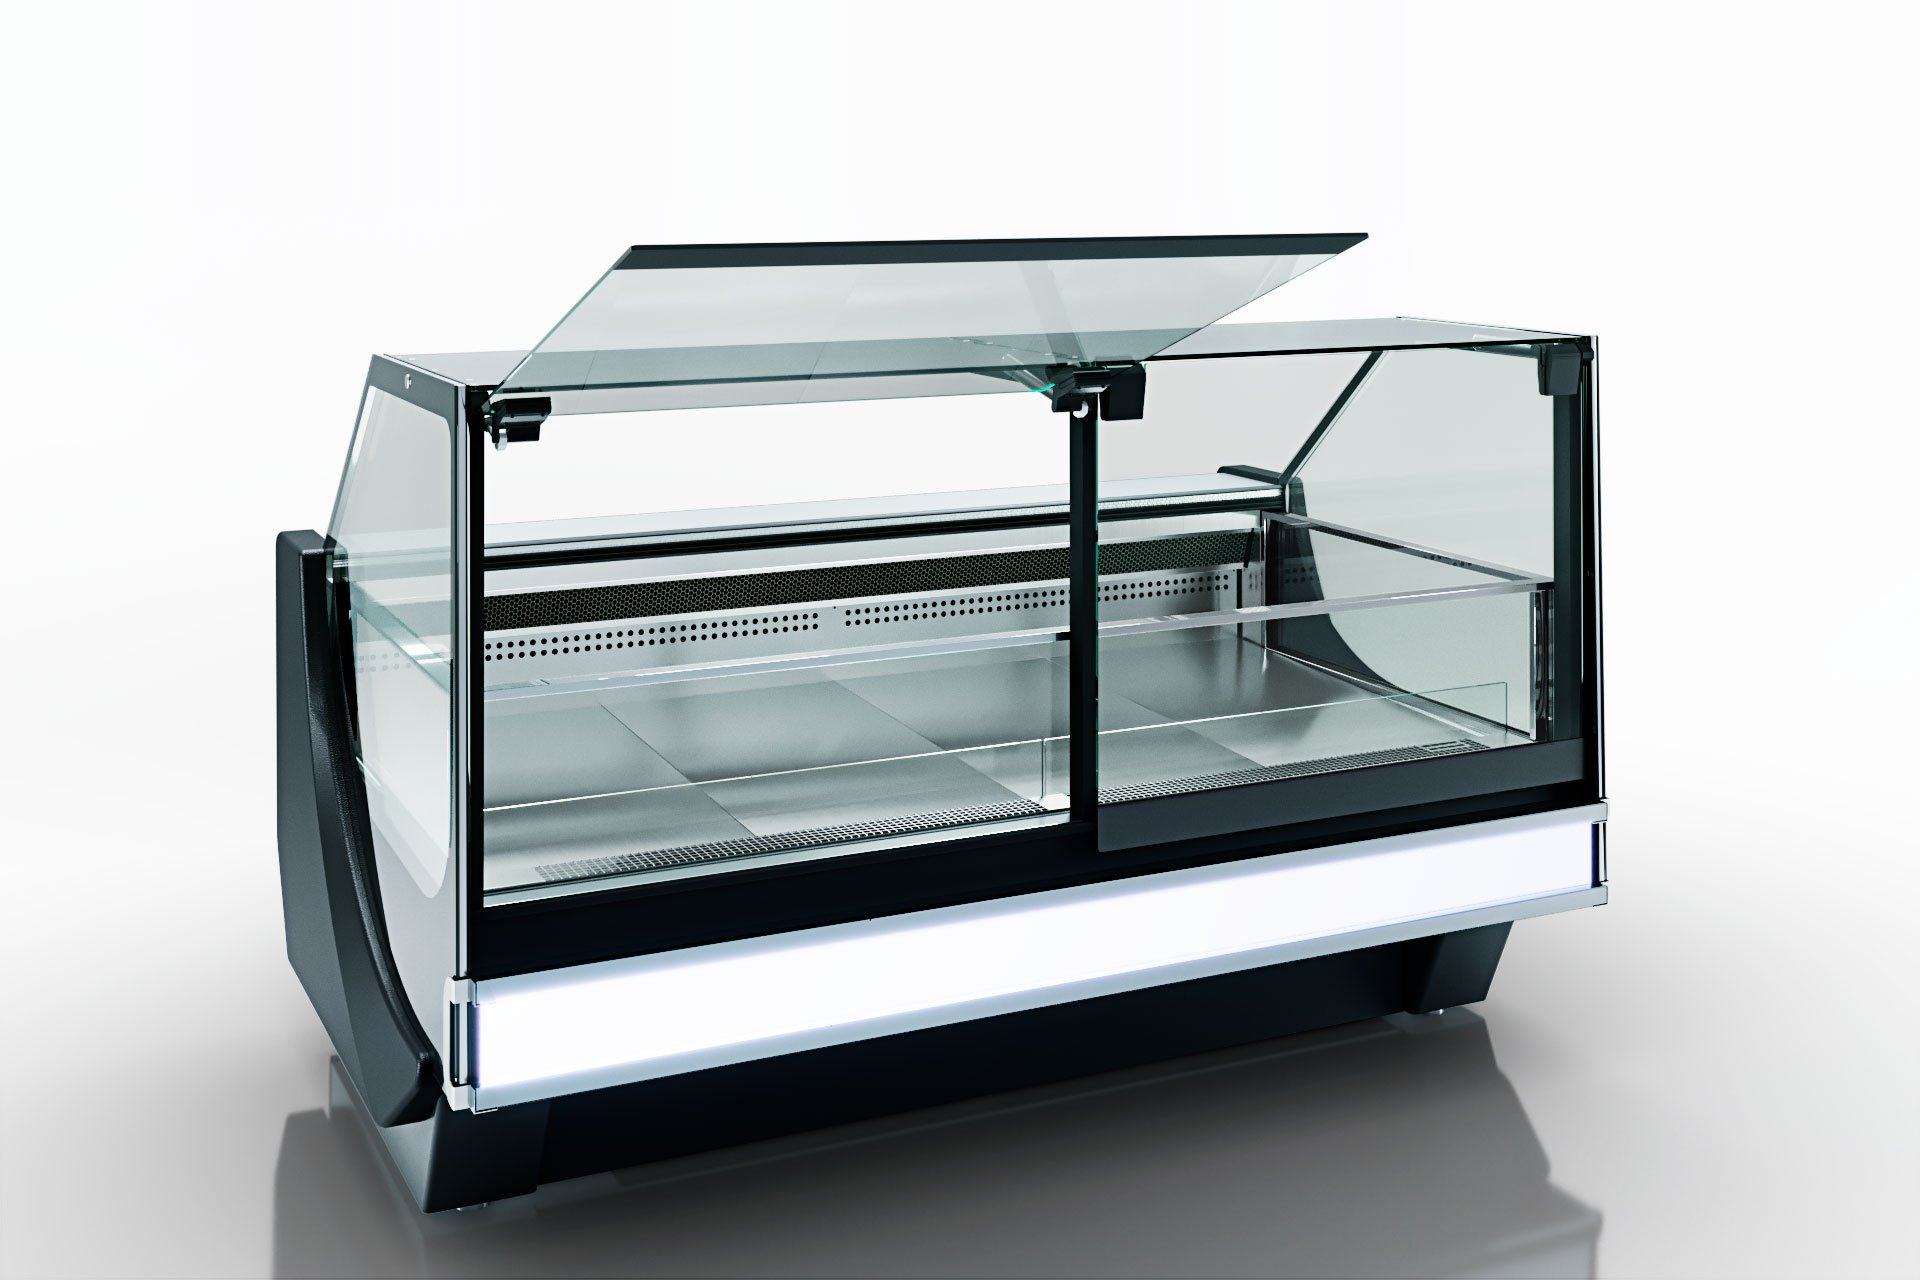 Missouri cold diamond MC 115 LT PS 121-DLM/A